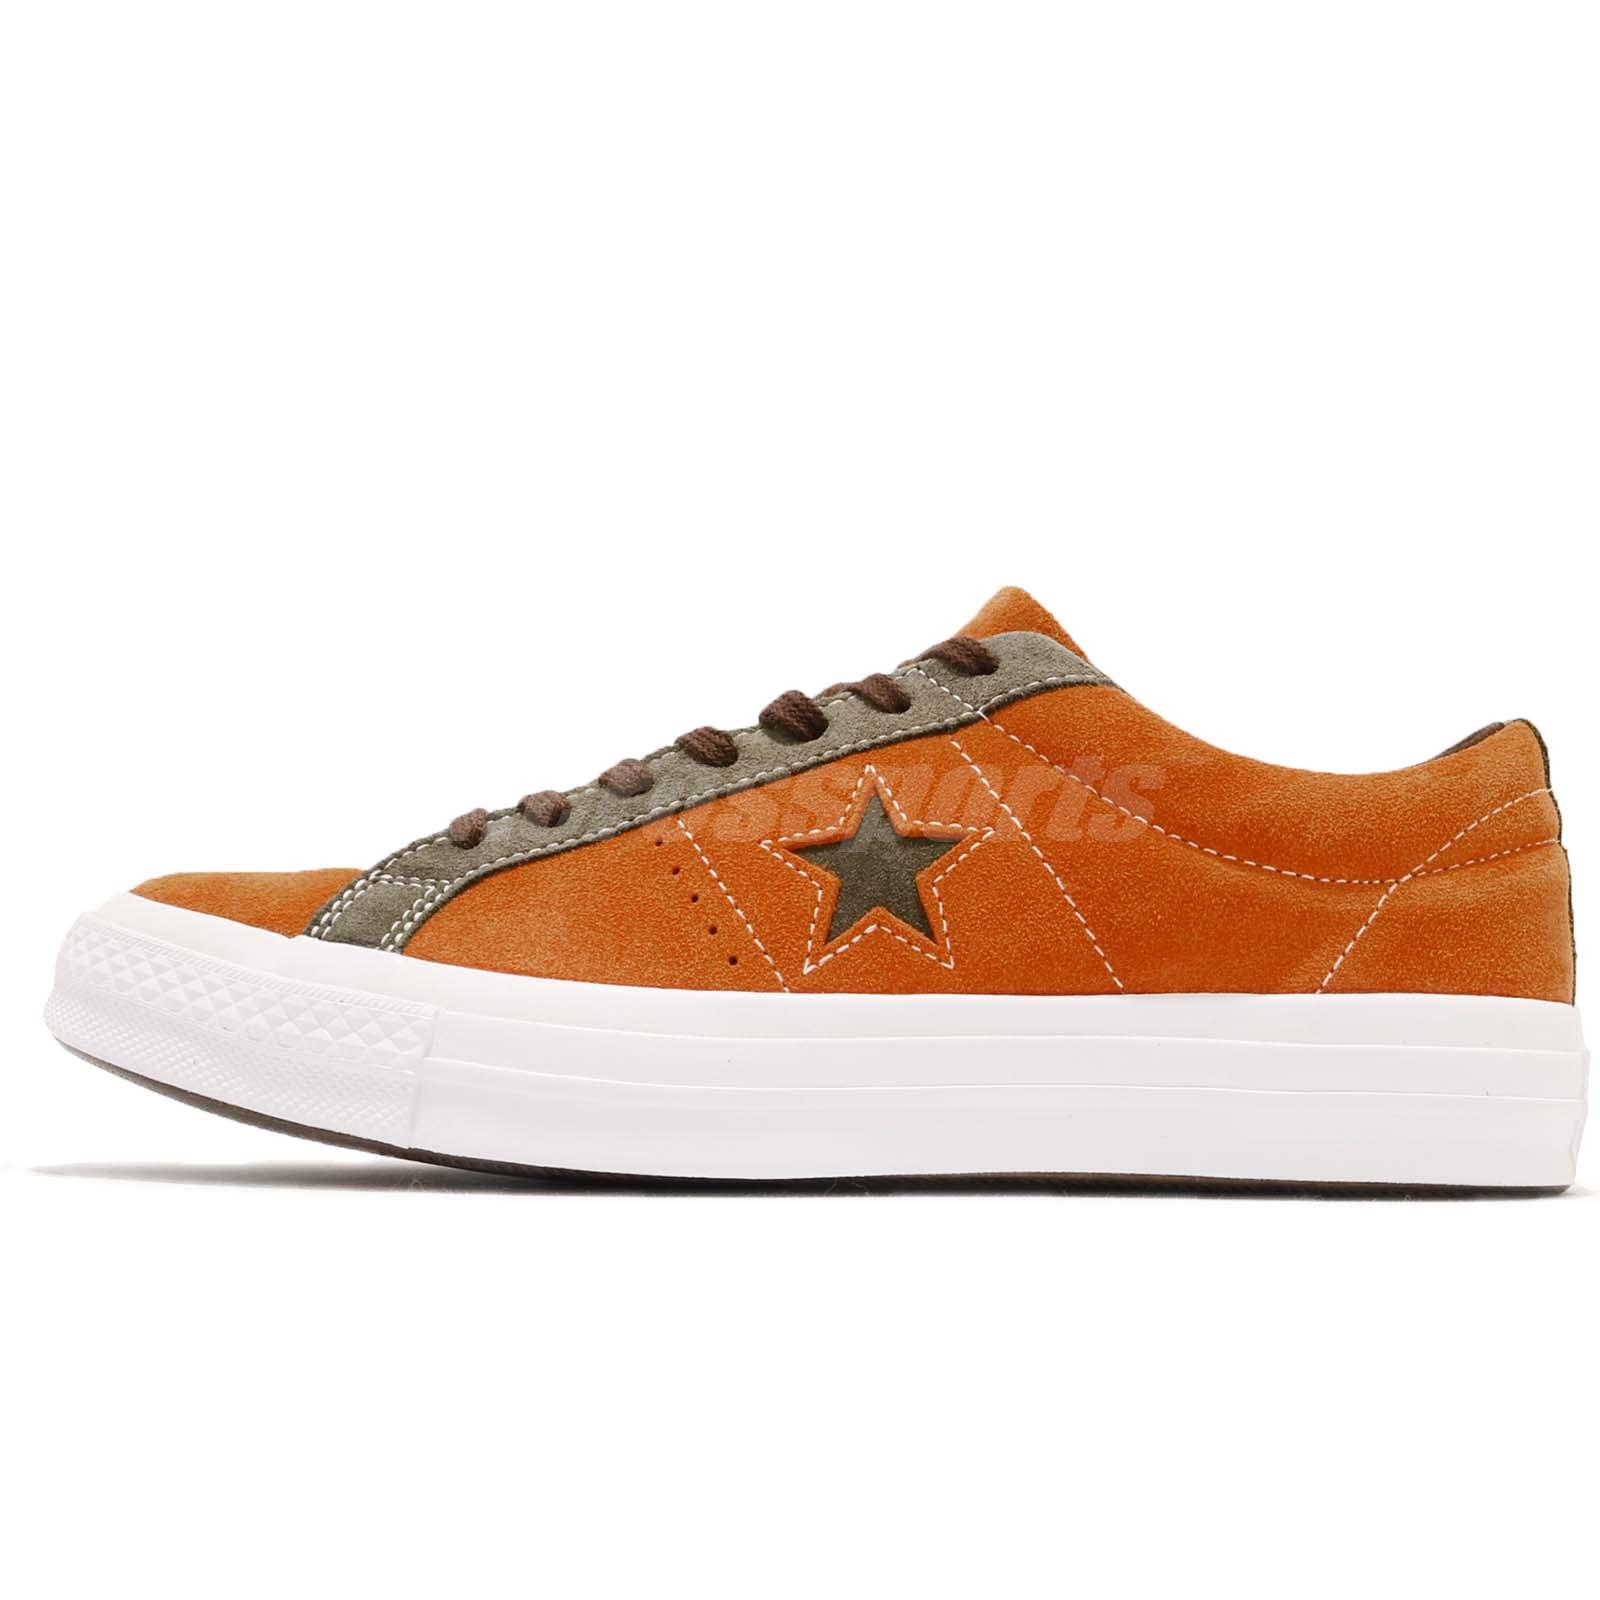 Converse One Star Orange Green White Suede Men Women Casual Shoe